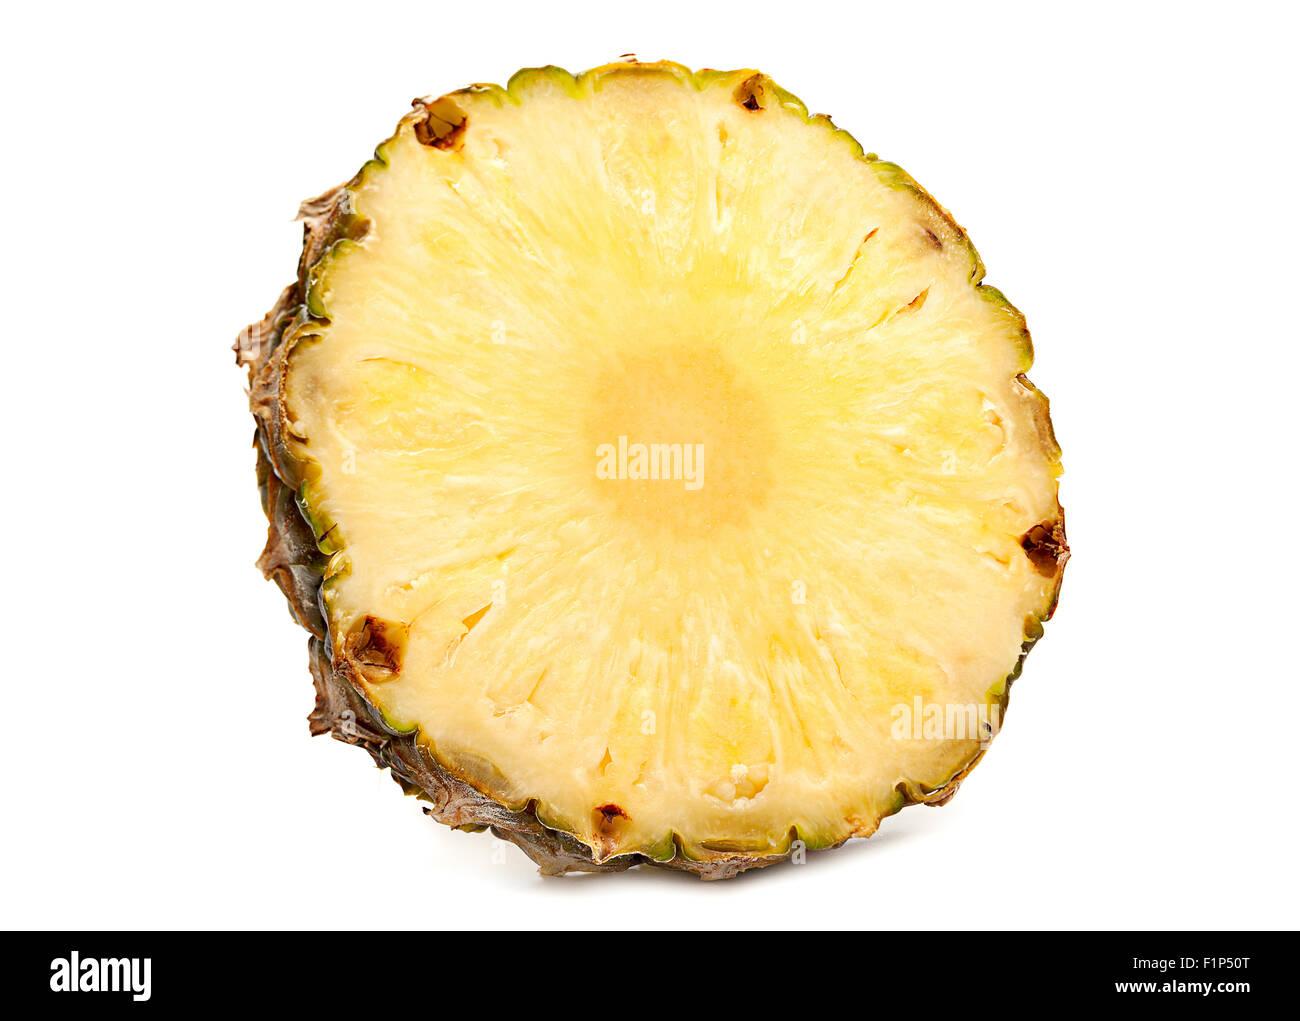 Pineapple fruit closeup isolated on white - Stock Image